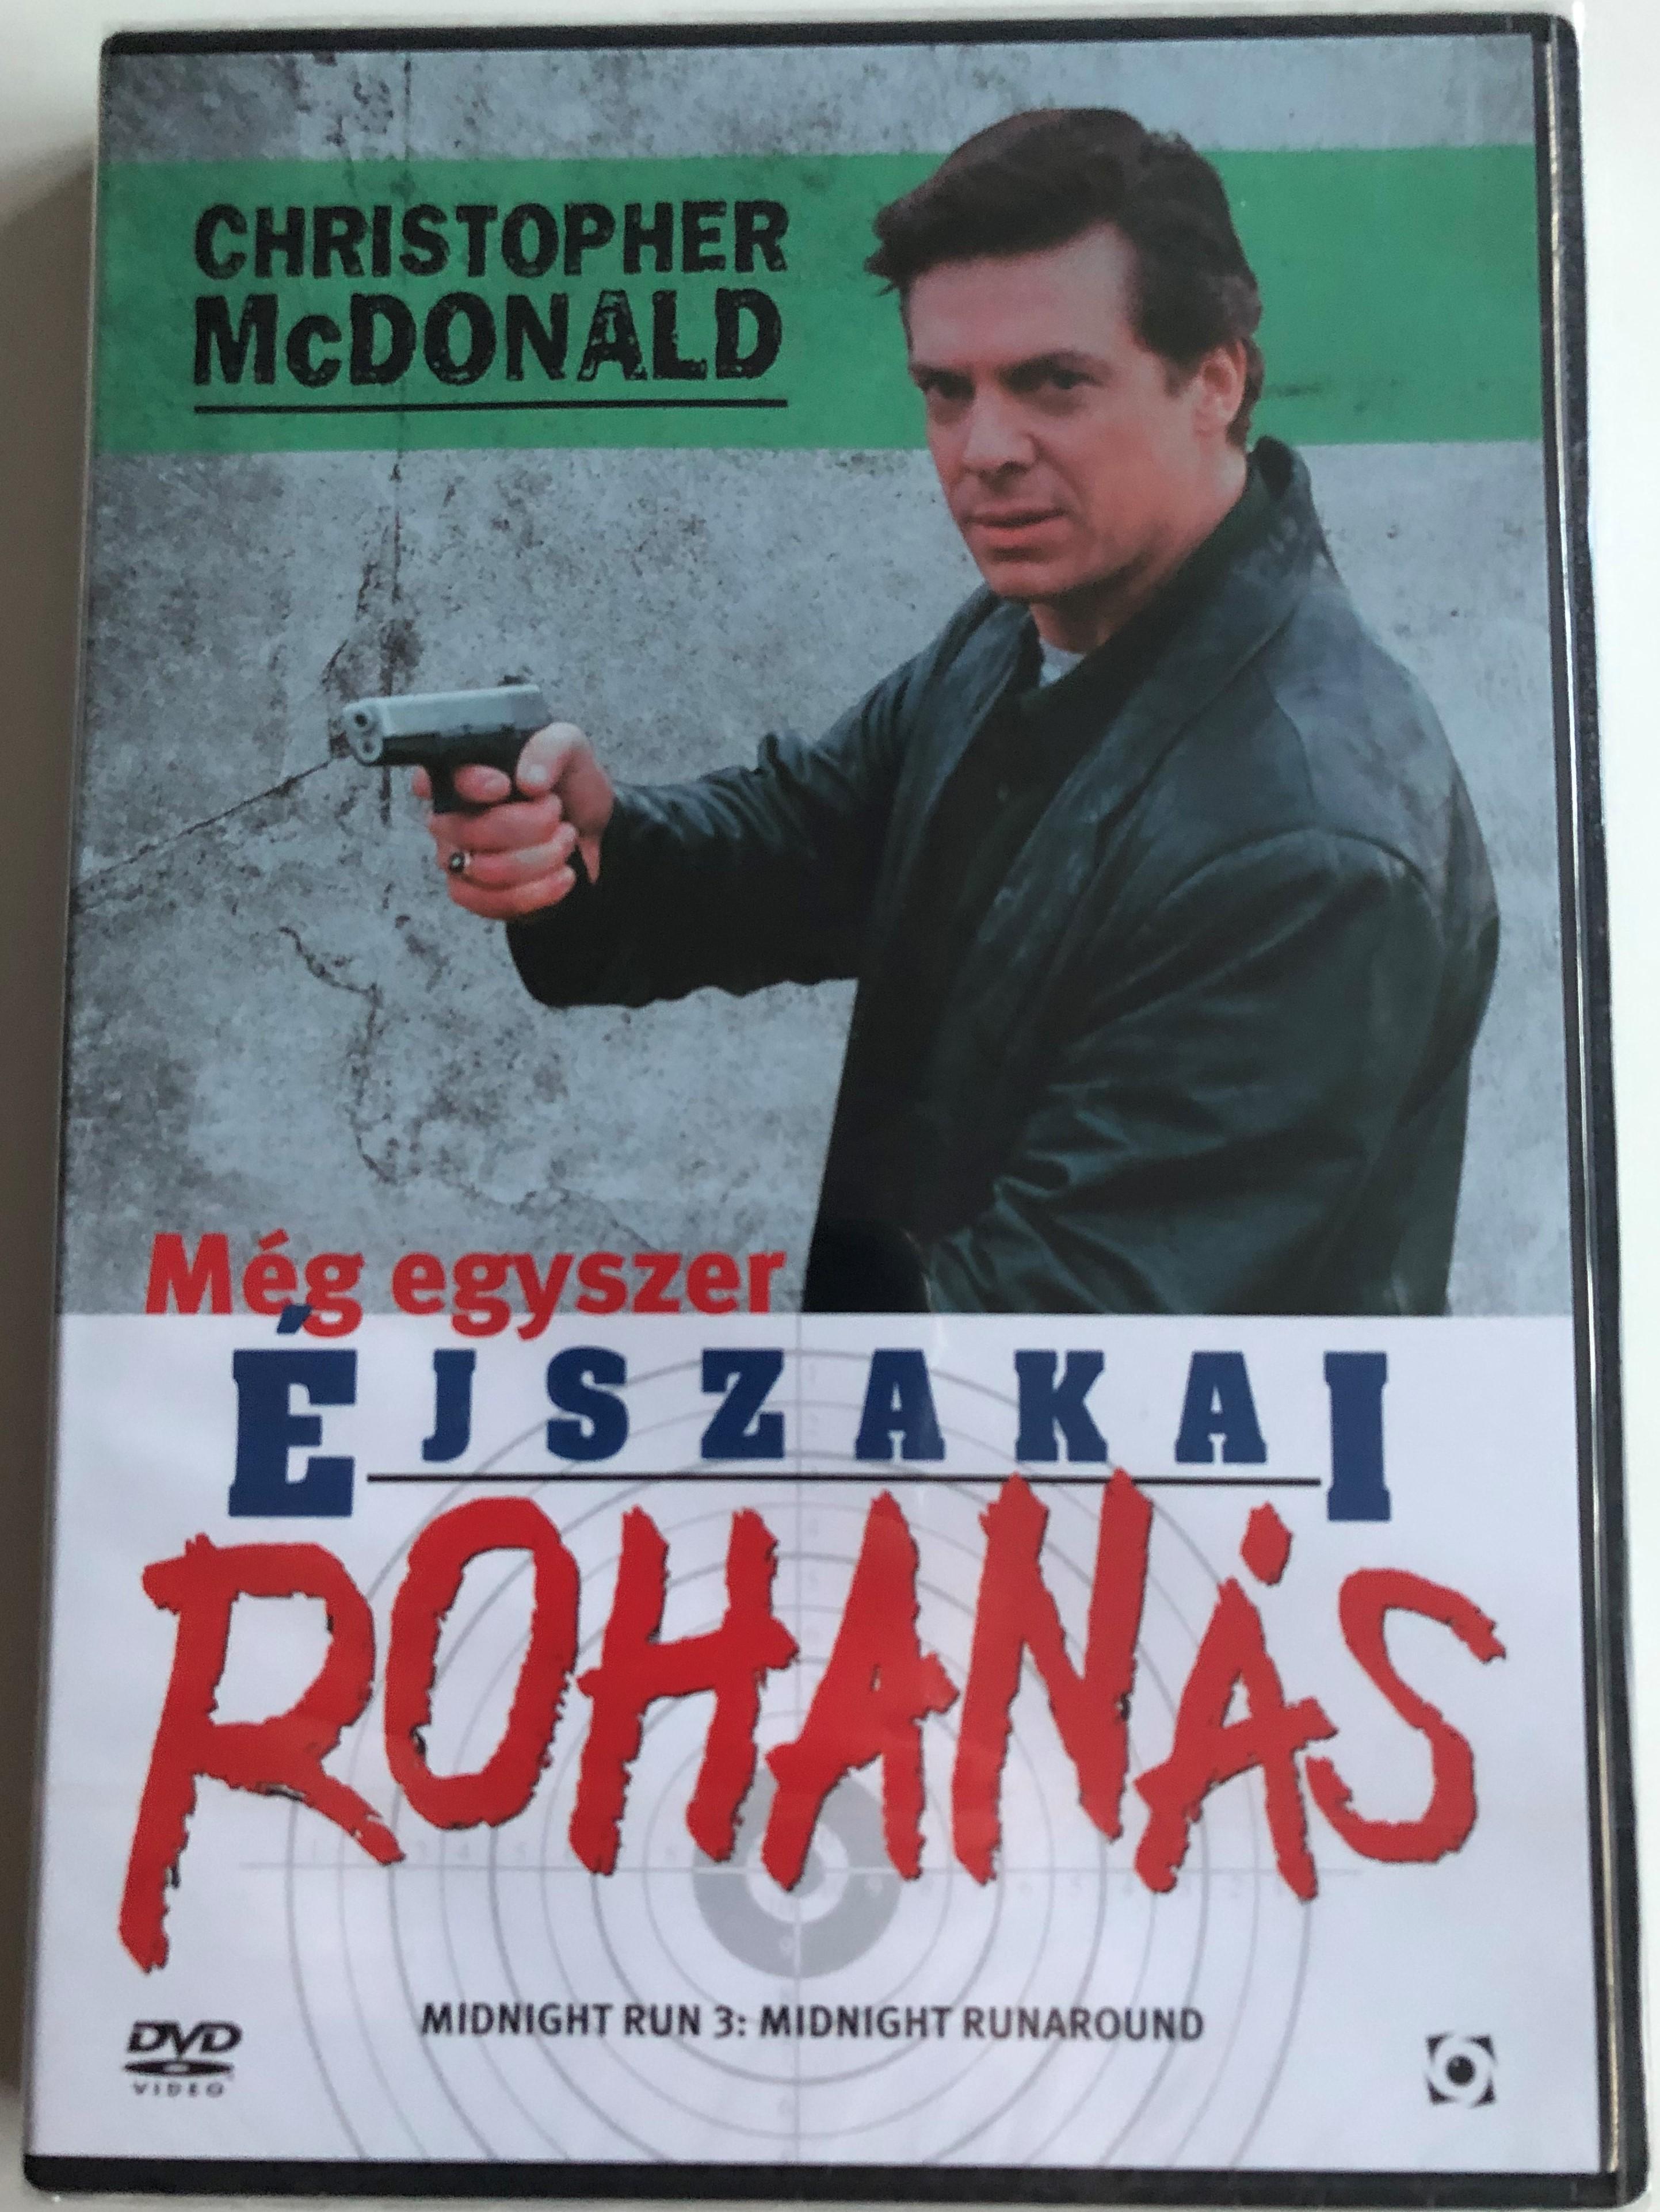 midnight-runaround-dvd-1994-m-g-egyszer-jszakai-rohan-s-1.jpg